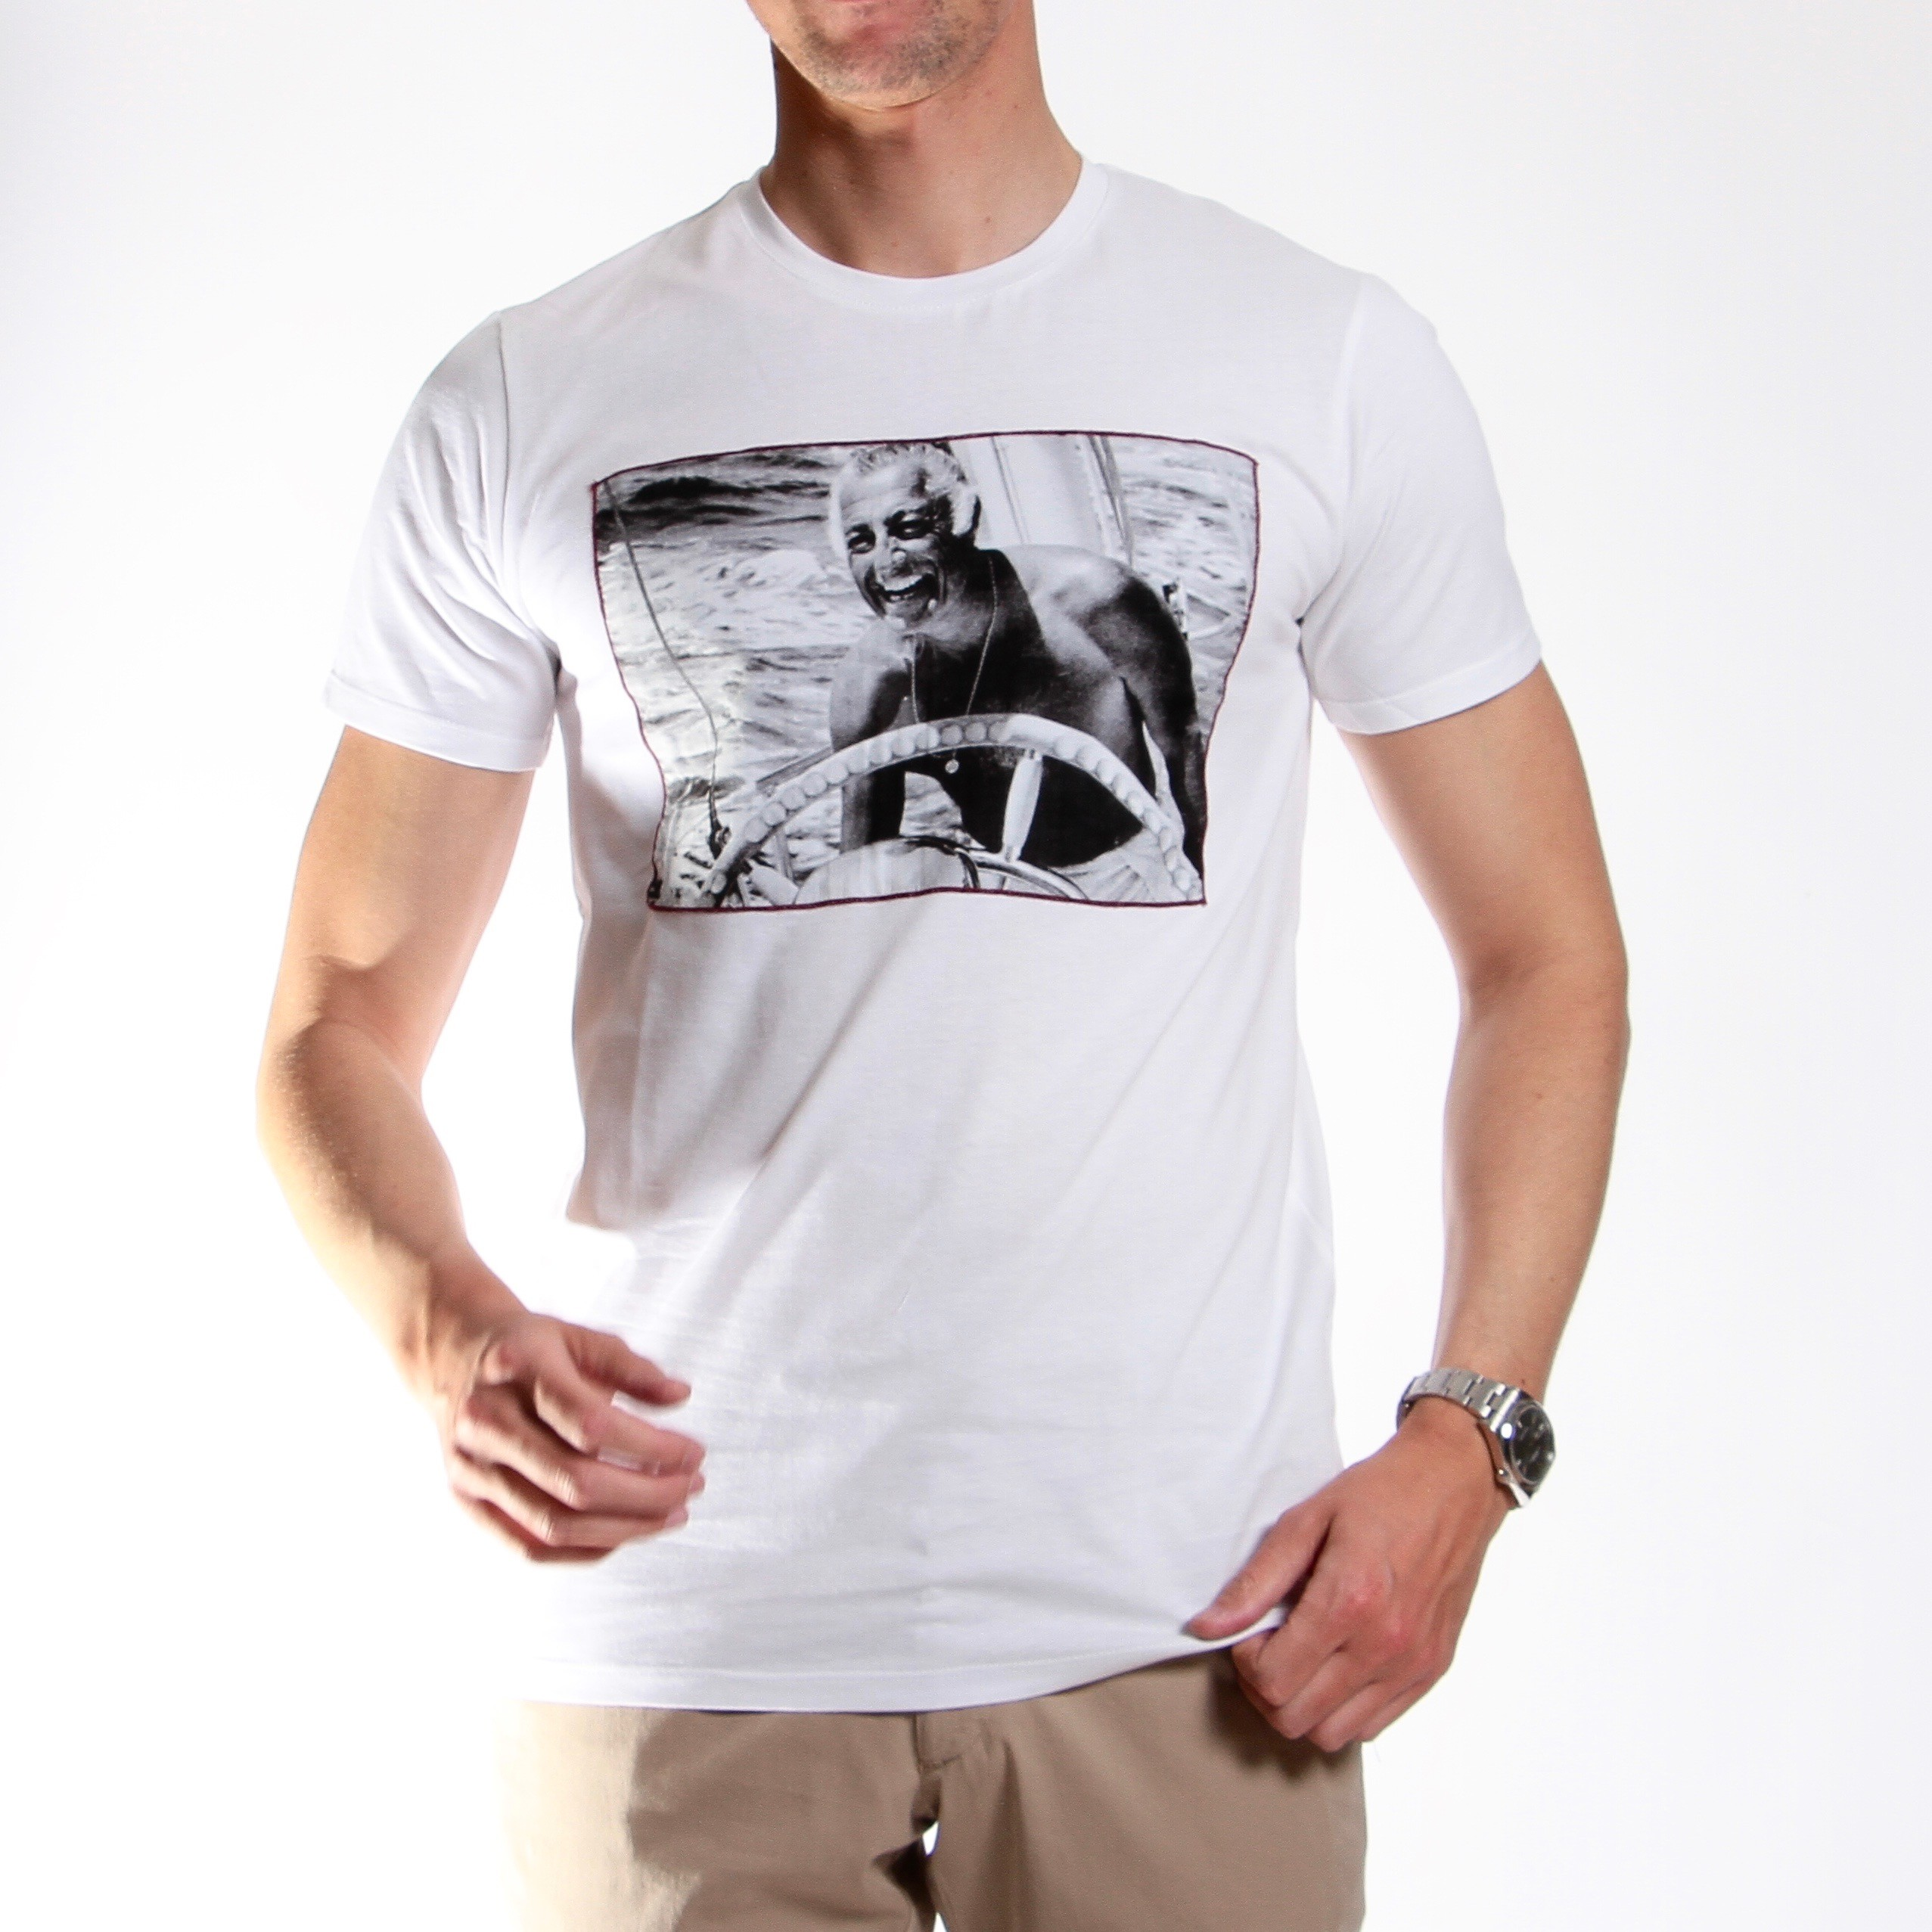 Tee-shirt Stampa : blanc - coton (Tee-shirt)